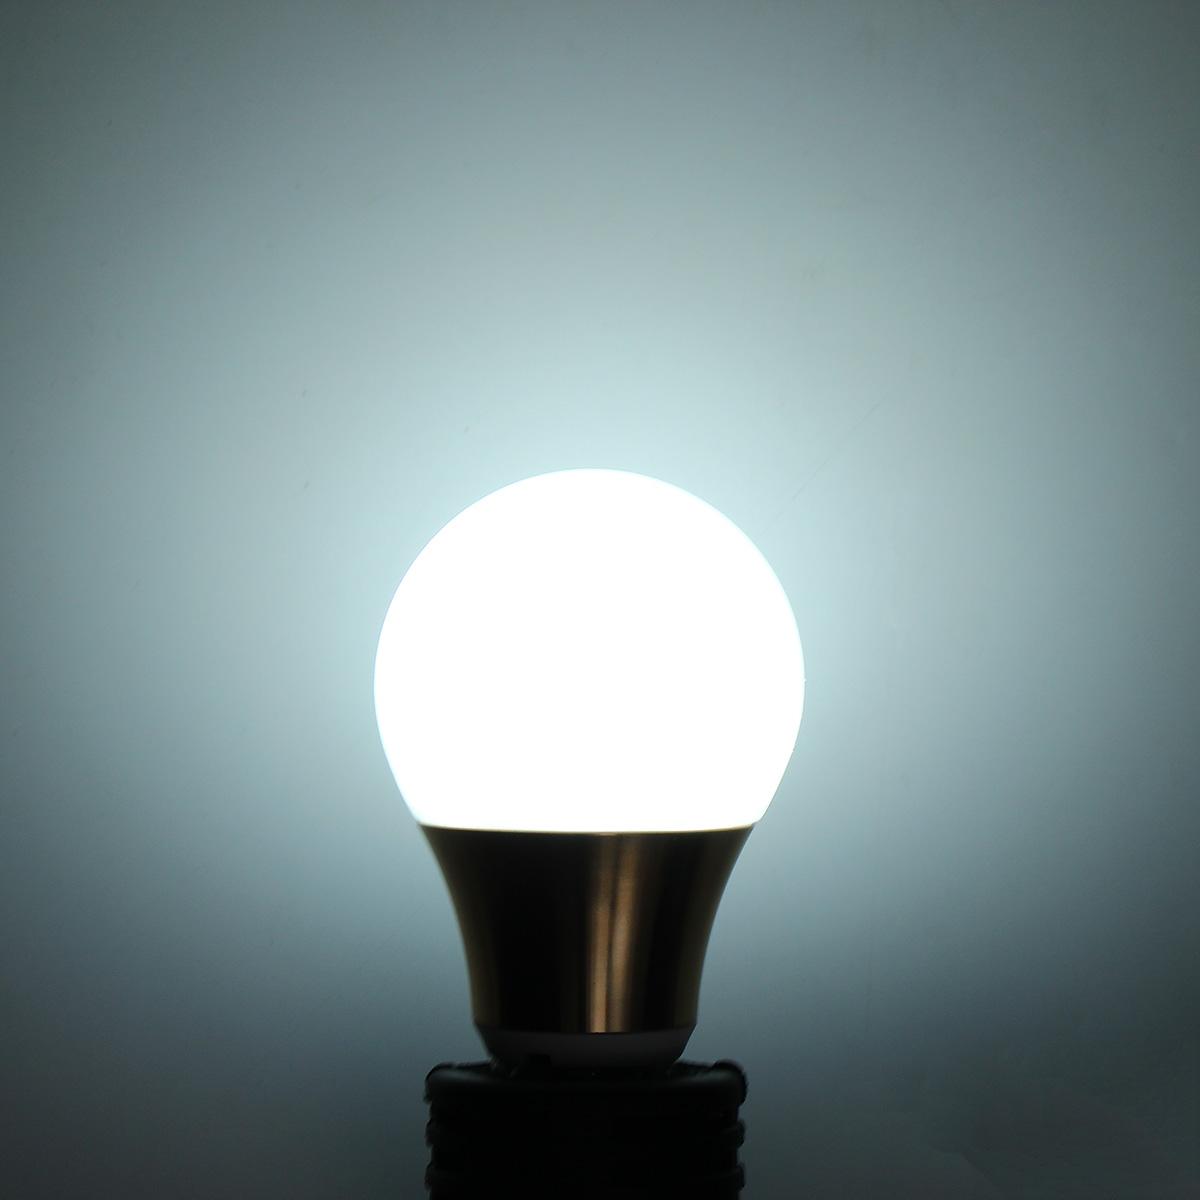 Dimmable E27 B22 5W 10 SMD 5730 LED Pure White Warm White Globe Lighting Bulb AC220V